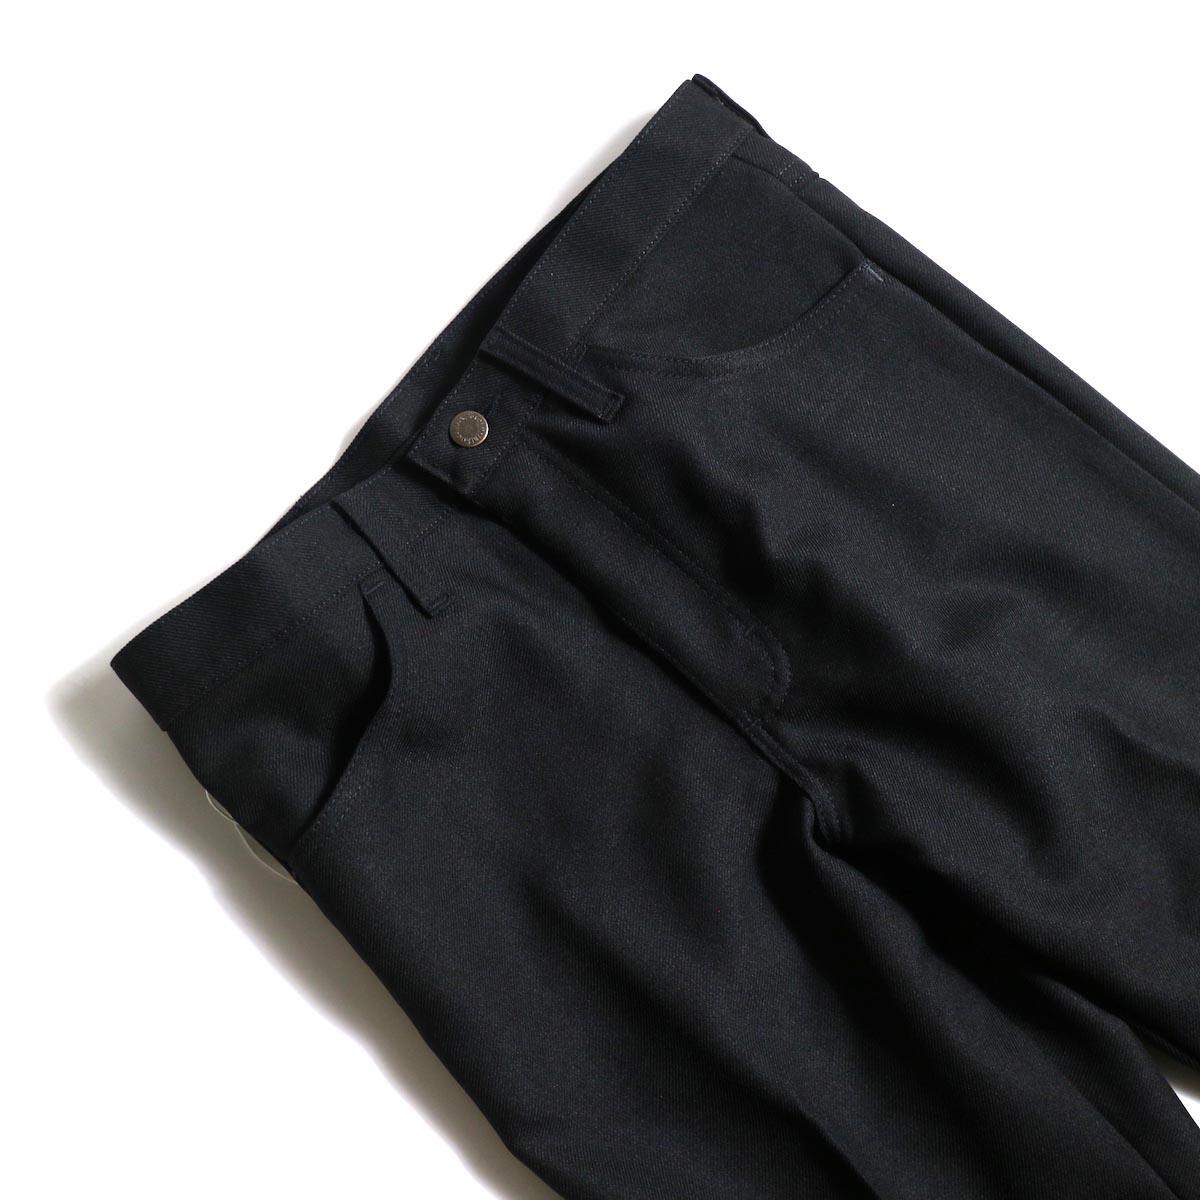 PRE_ / ZK OPEN PANTS (Black)ウエスト